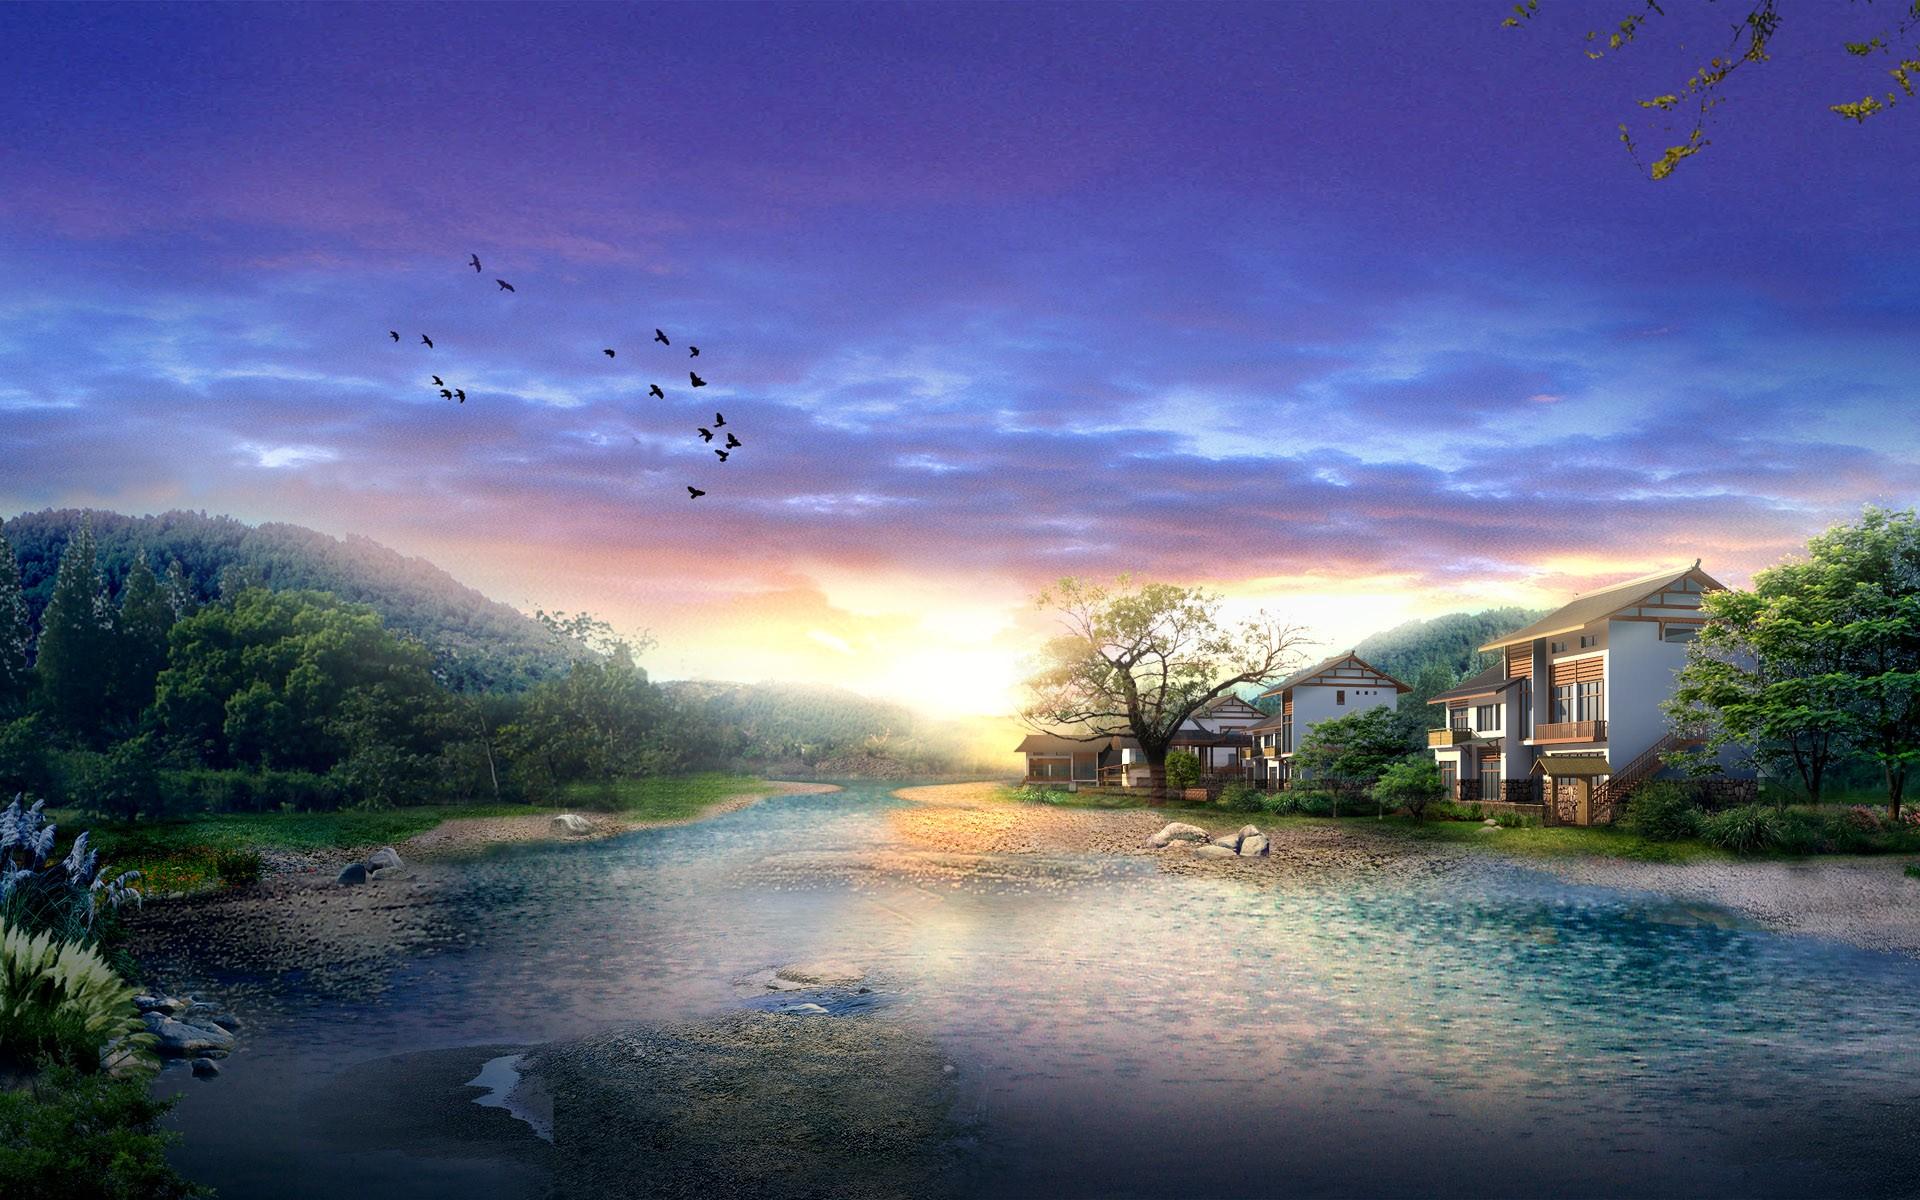 Sunrise in Digital Japan Wallpapers HD Wallpapers 1920x1200